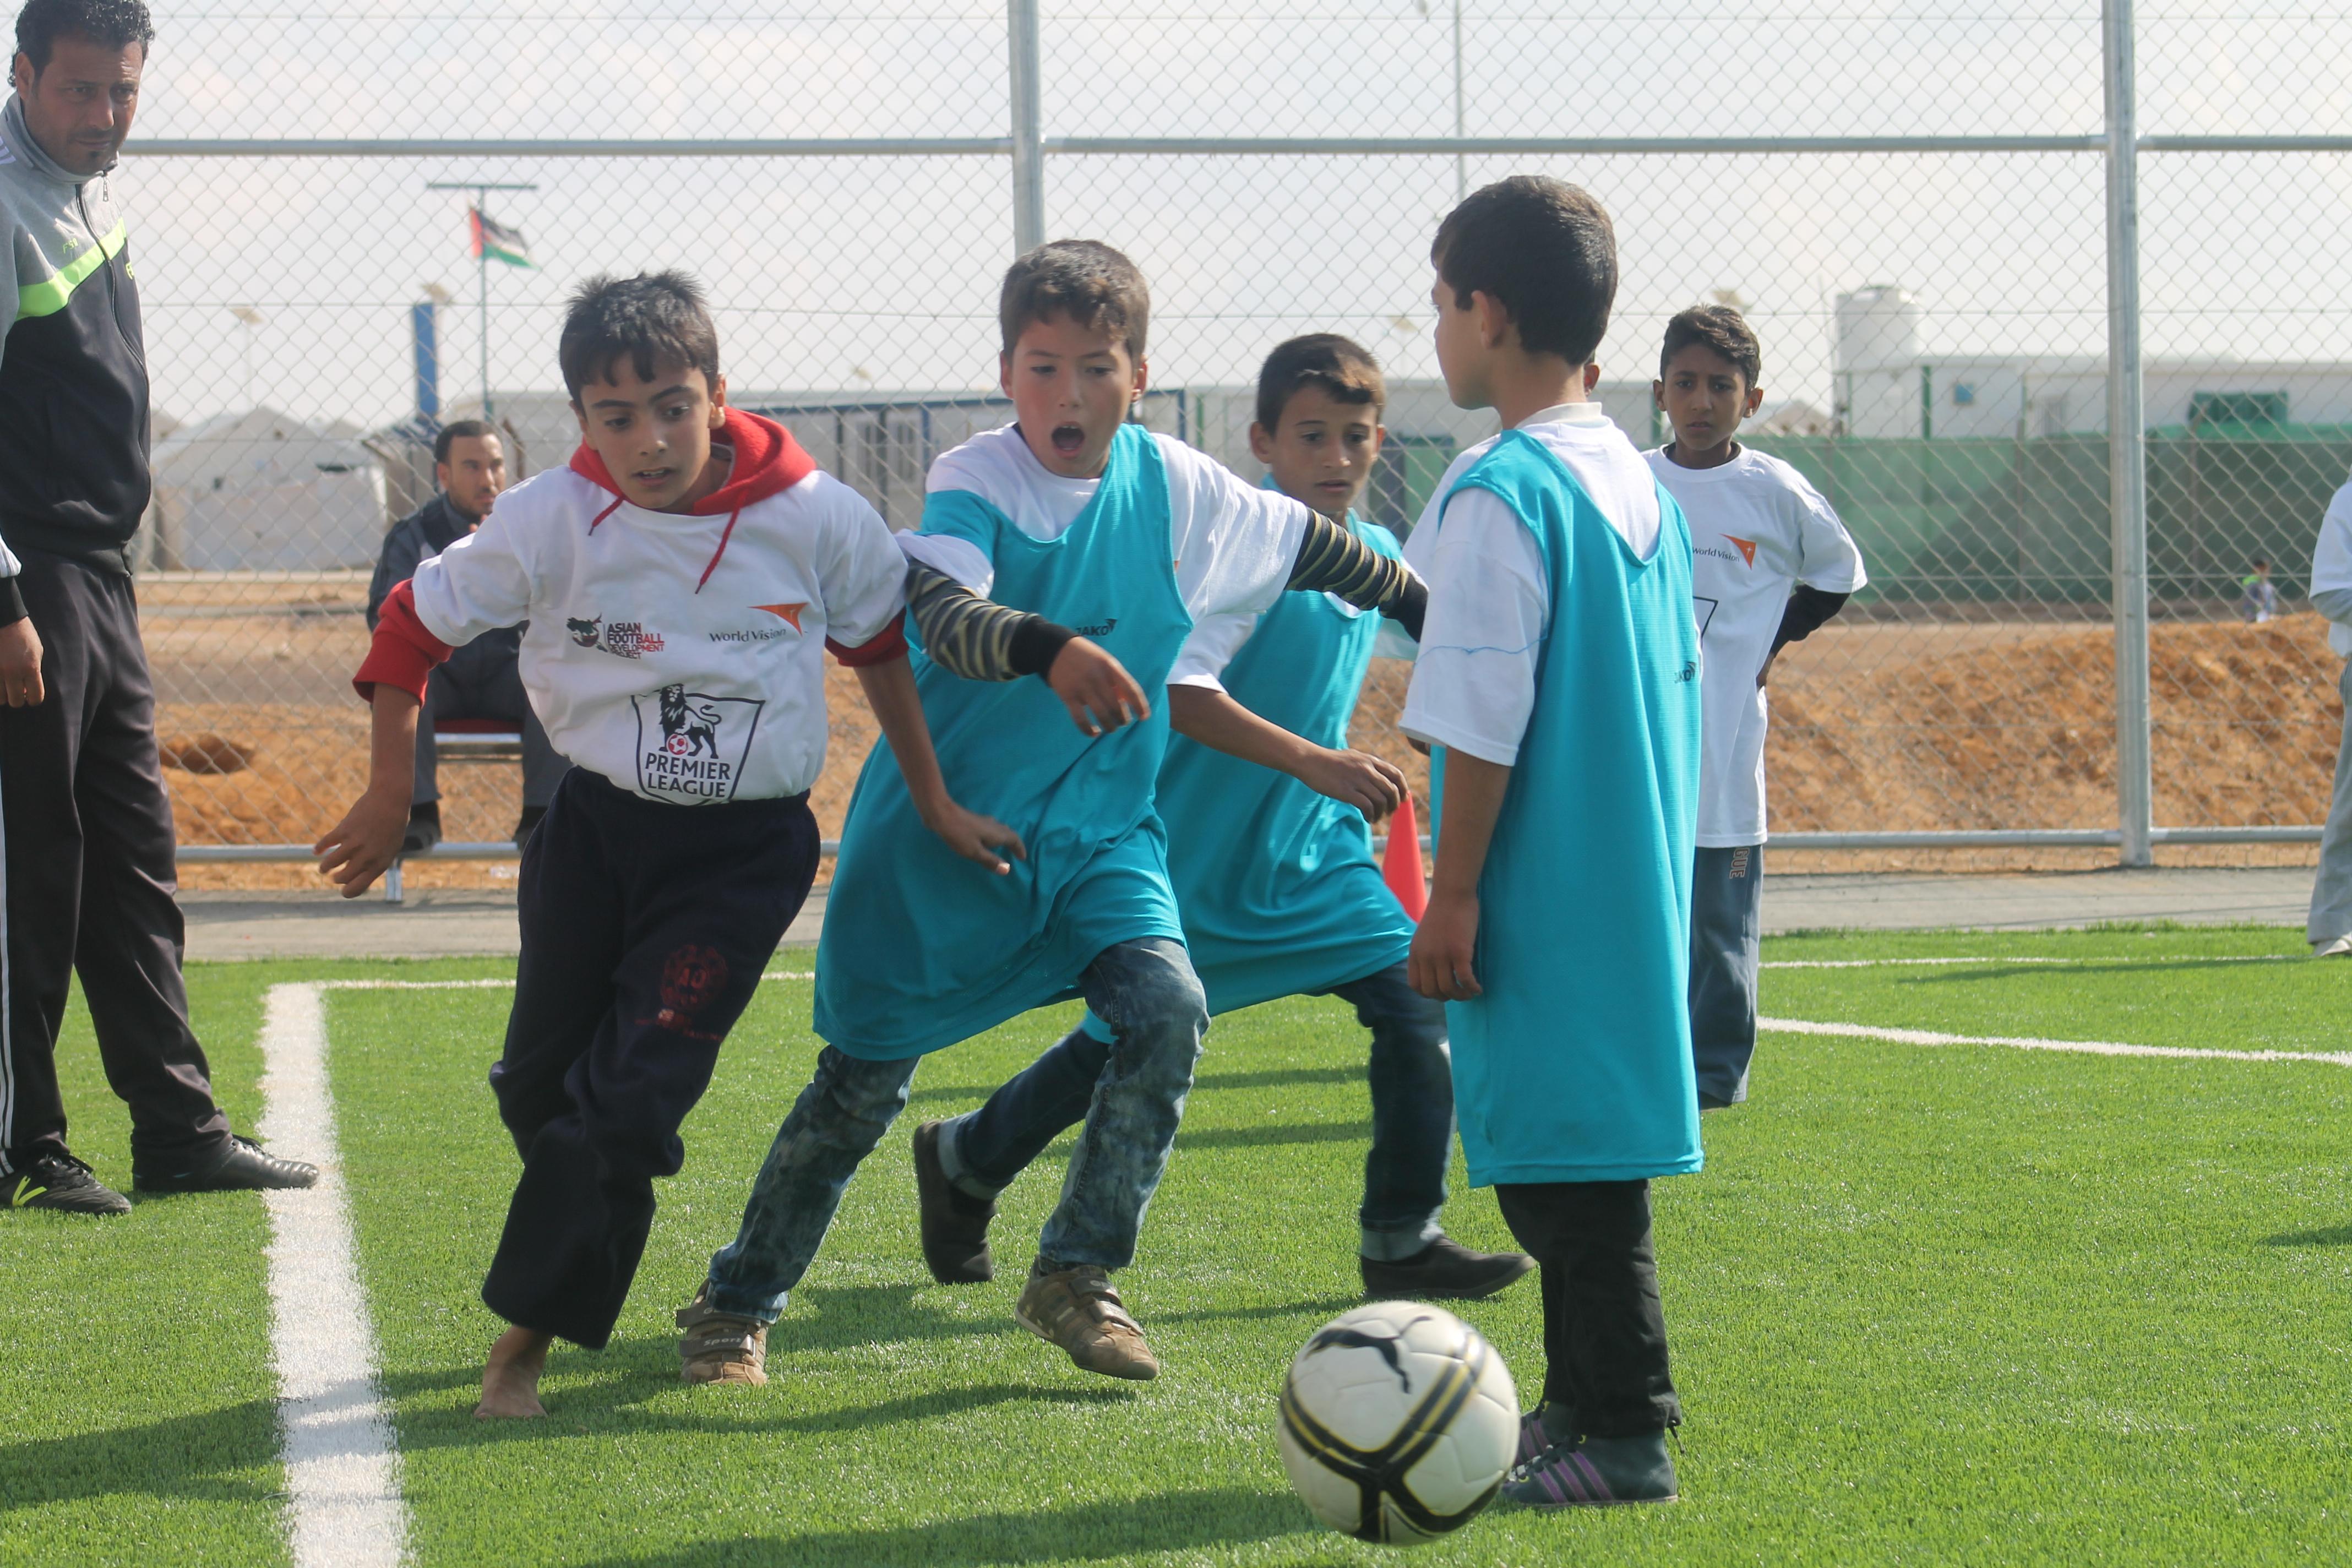 PL_Workshop_Football_Festival_Nov._19_2015_Azraq_Camp_11.JPG